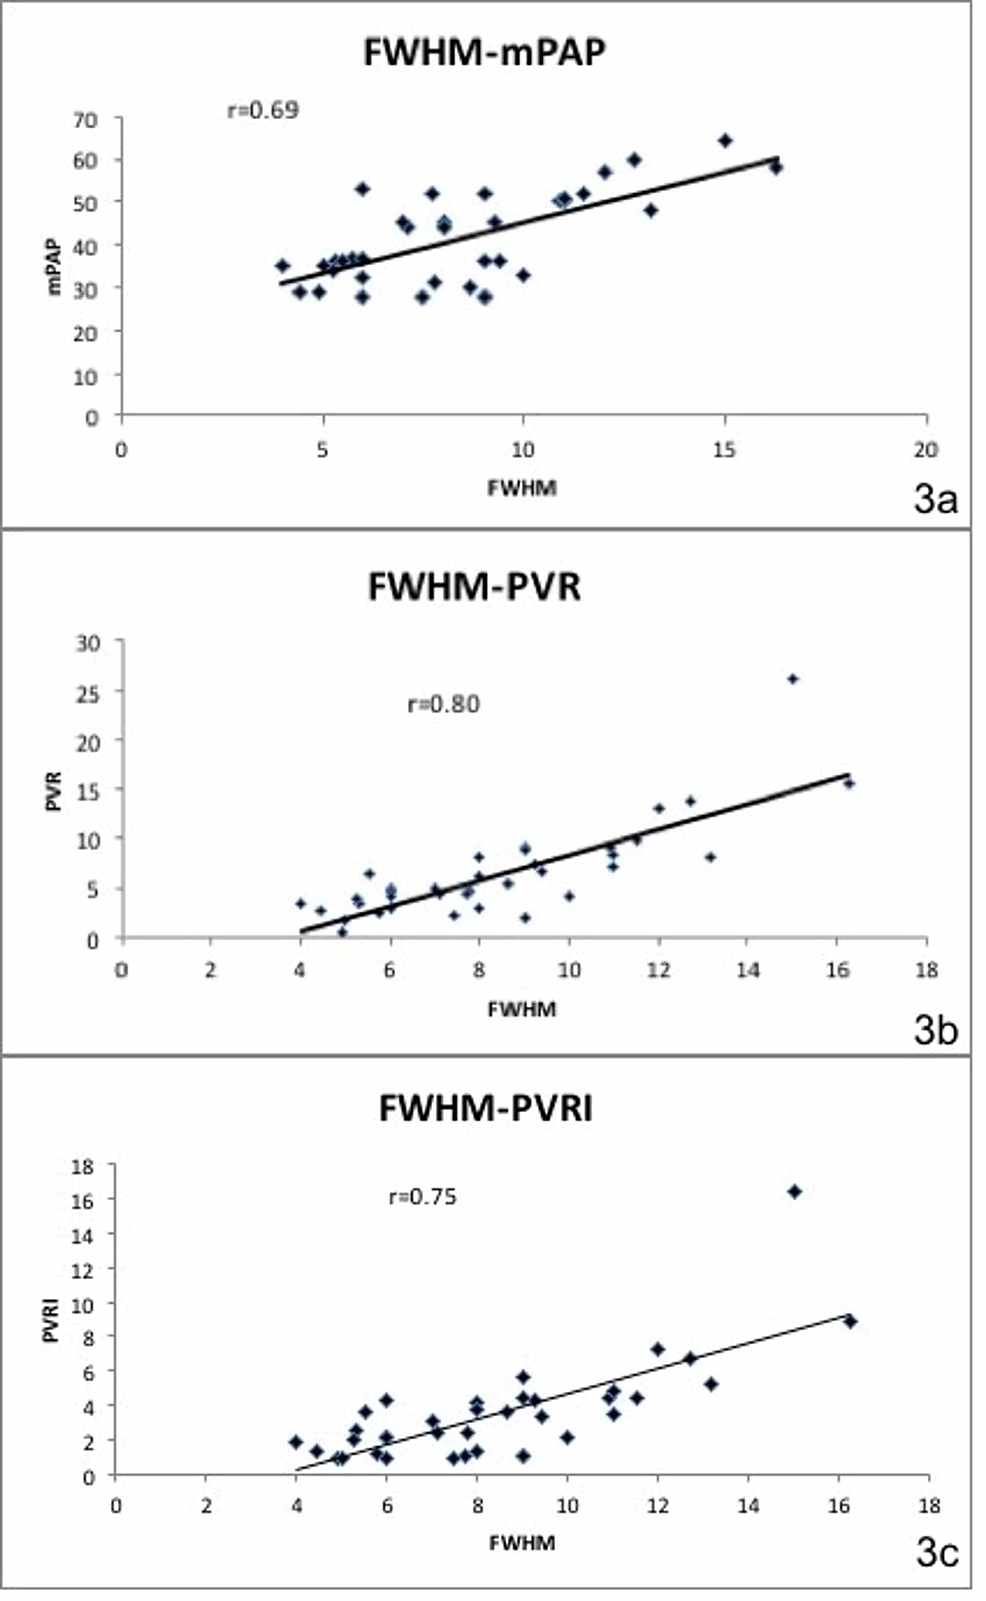 Full-width-at-half-maximum-(FWHM)-and-right-heart-catheterization-(RHC)-parameters.